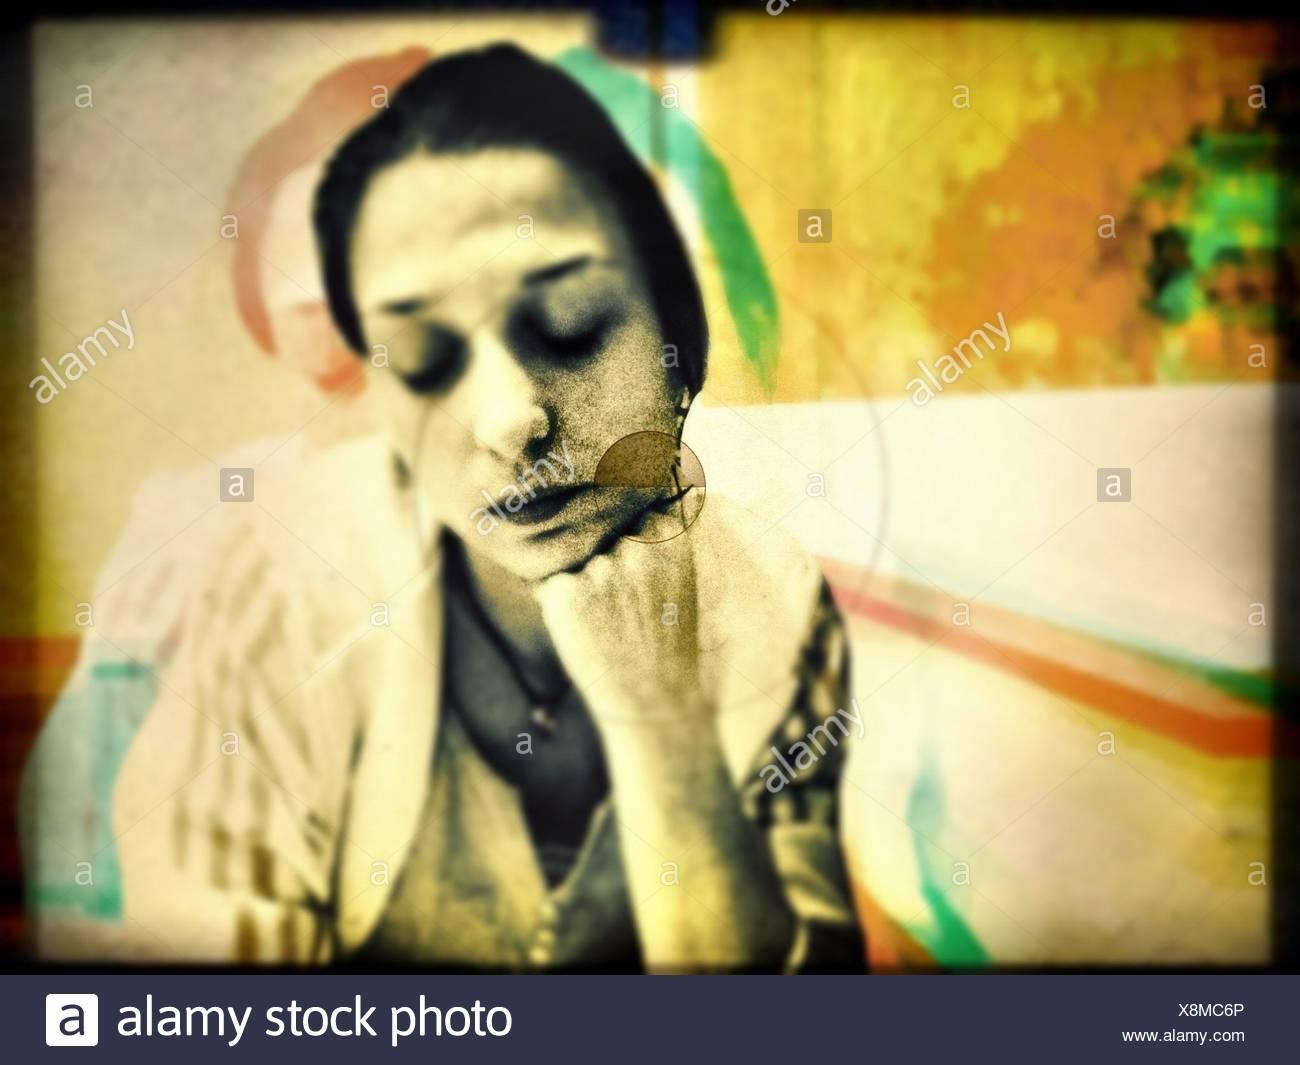 Portrait Of Pensive Woman - Stock Image